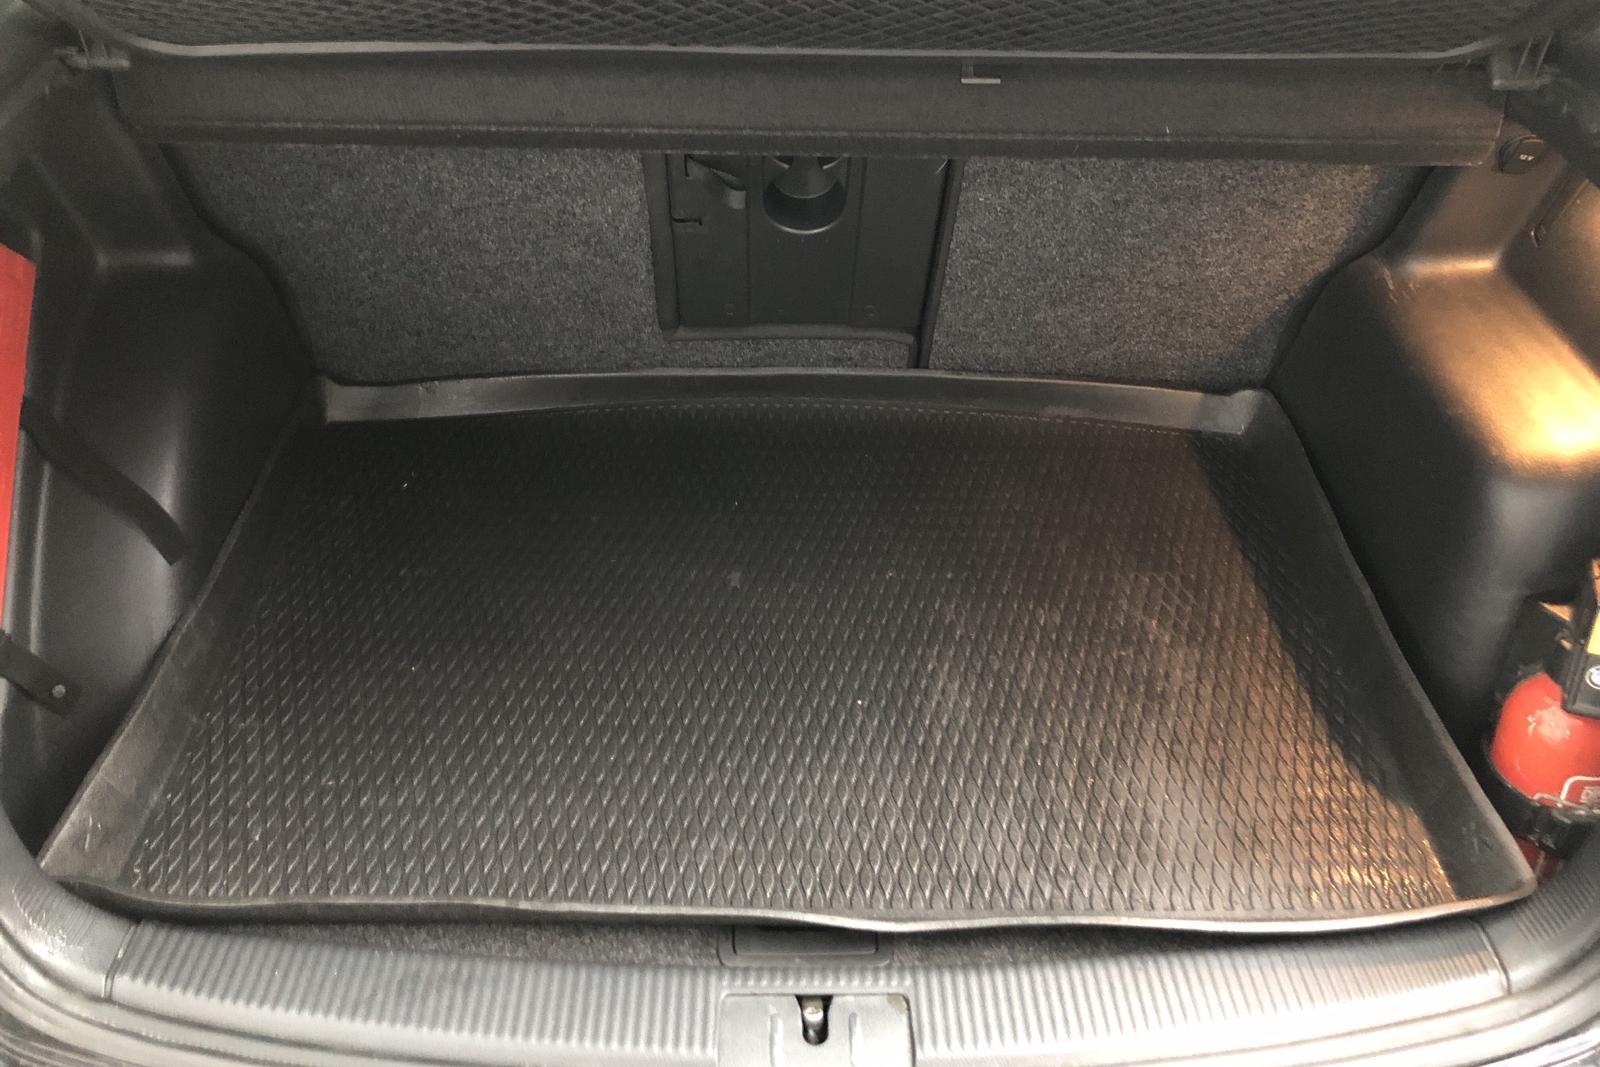 VW Golf VI 1.6 TDI BlueMotion Technology Plus (105hk) - 85 870 km - Manual - black - 2012